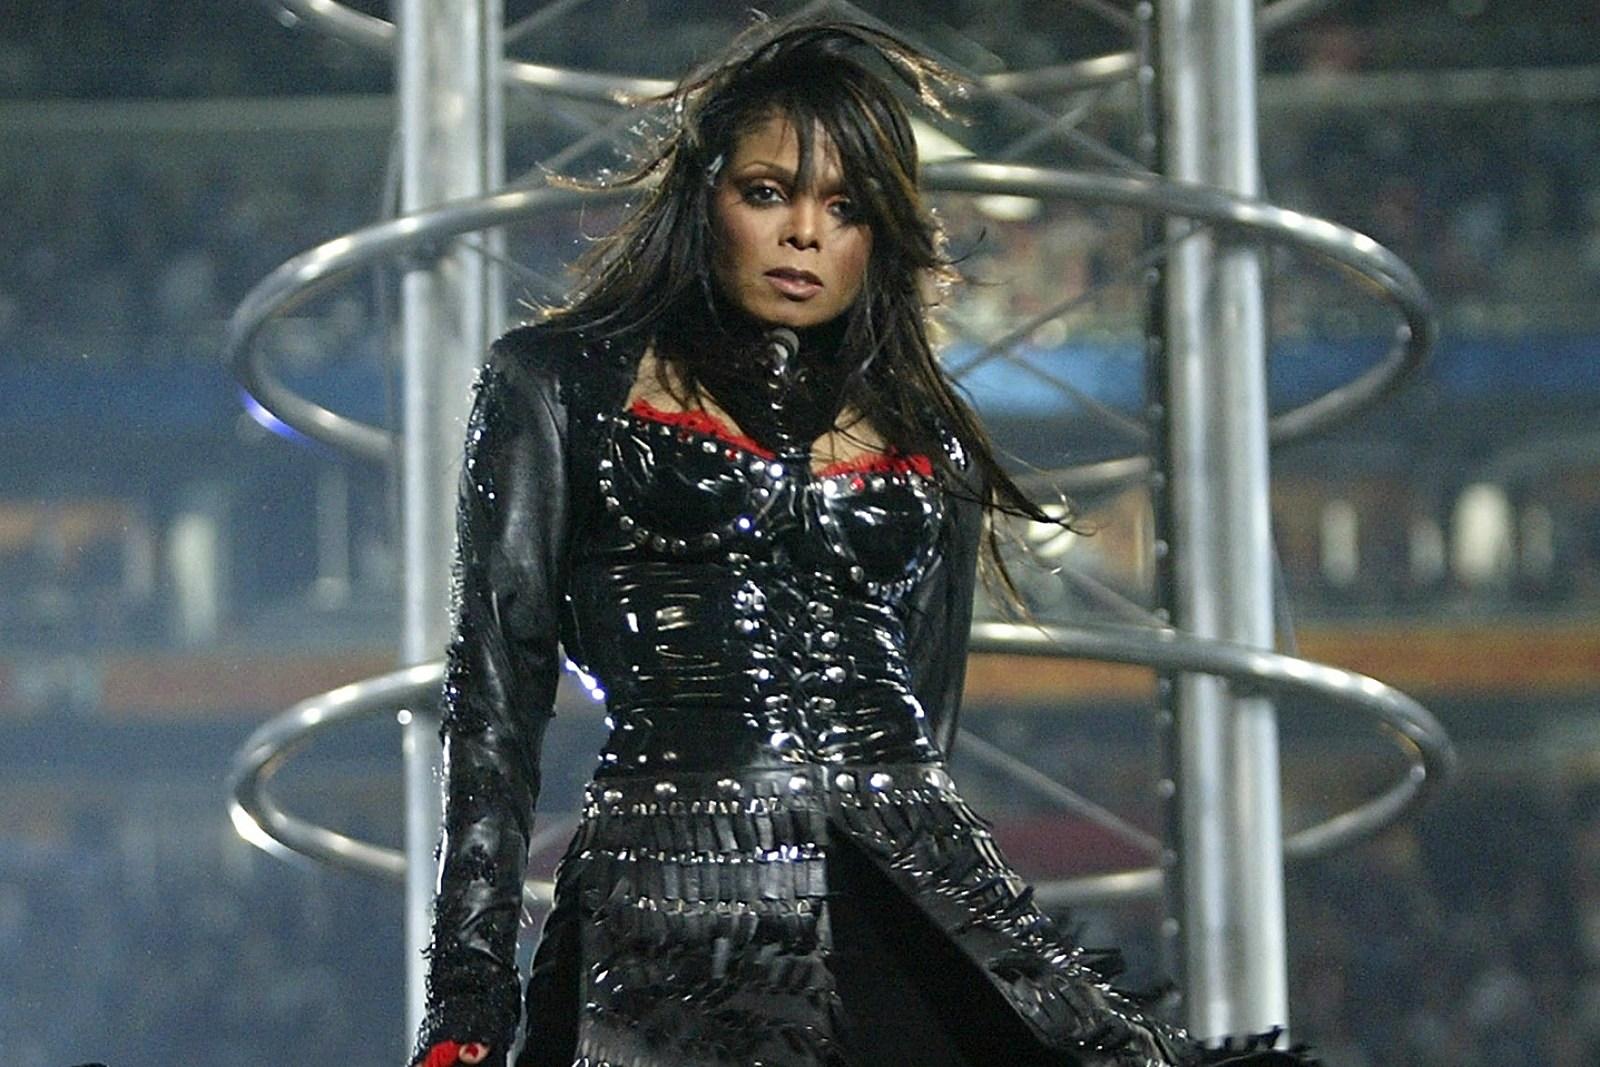 5 Reasons Janet Jackson Belongs in the Rock & Roll Hall of Fame